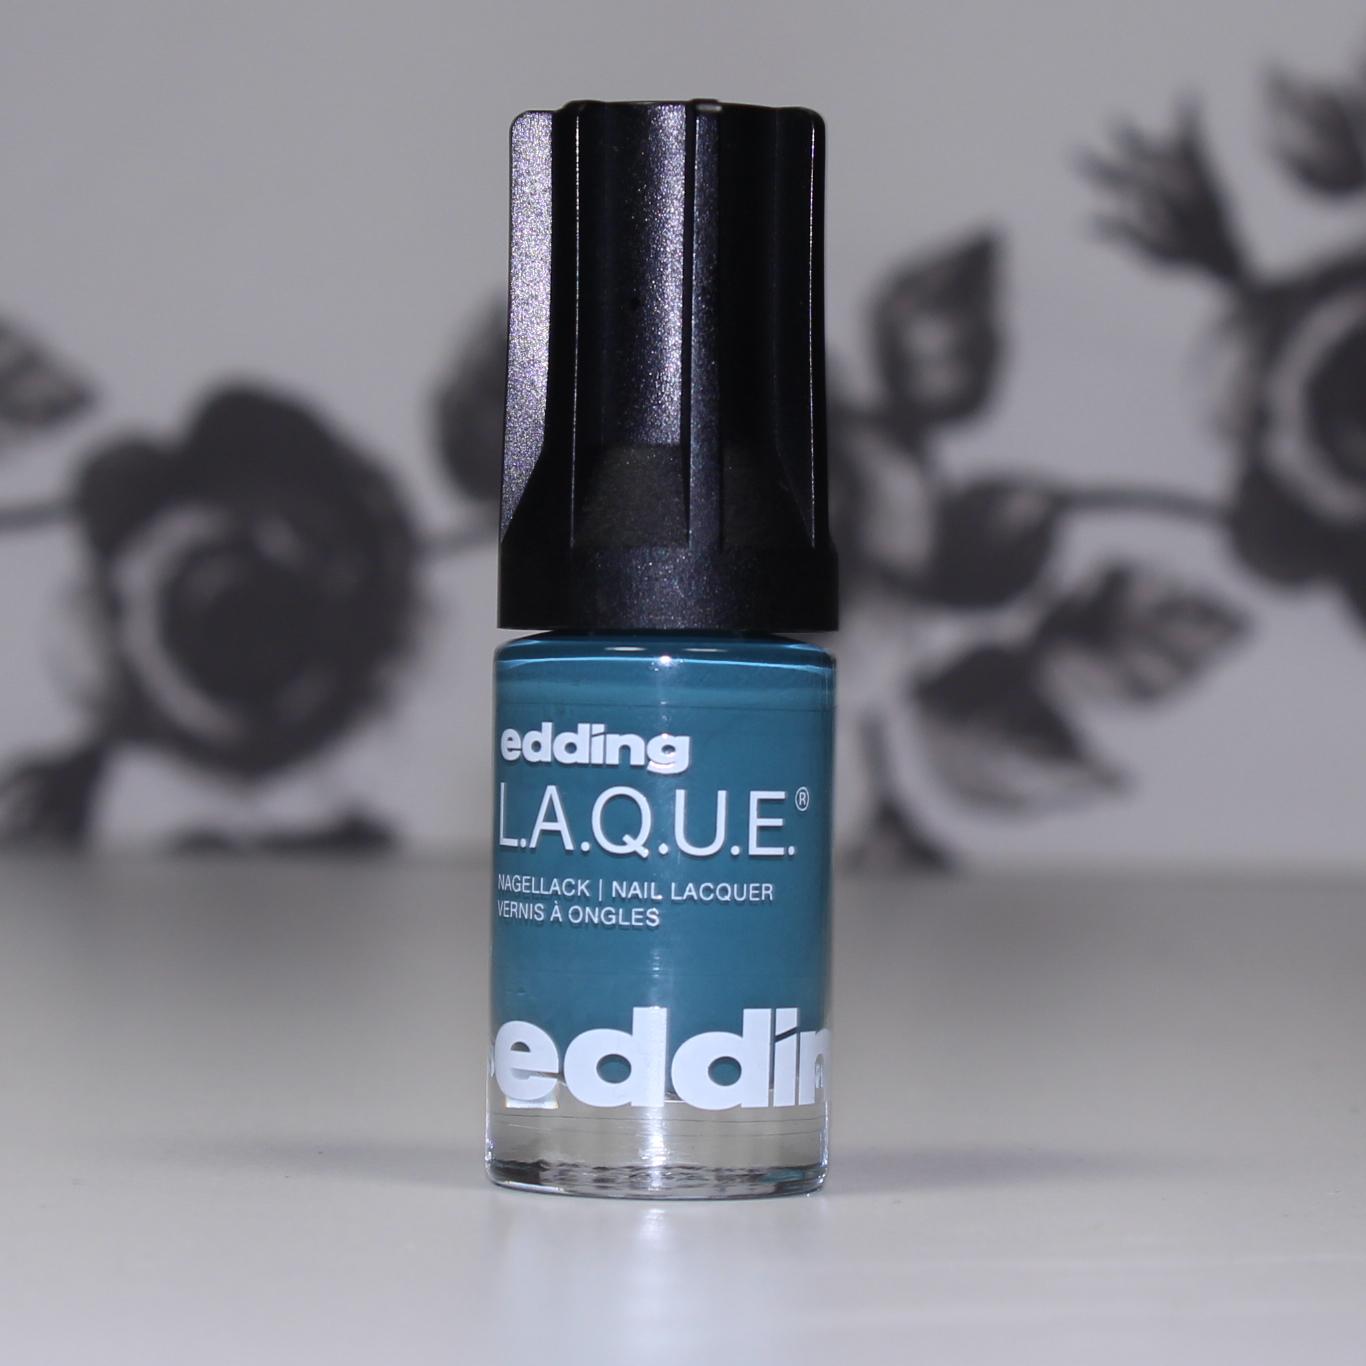 edding-laque-steady-steel-blue